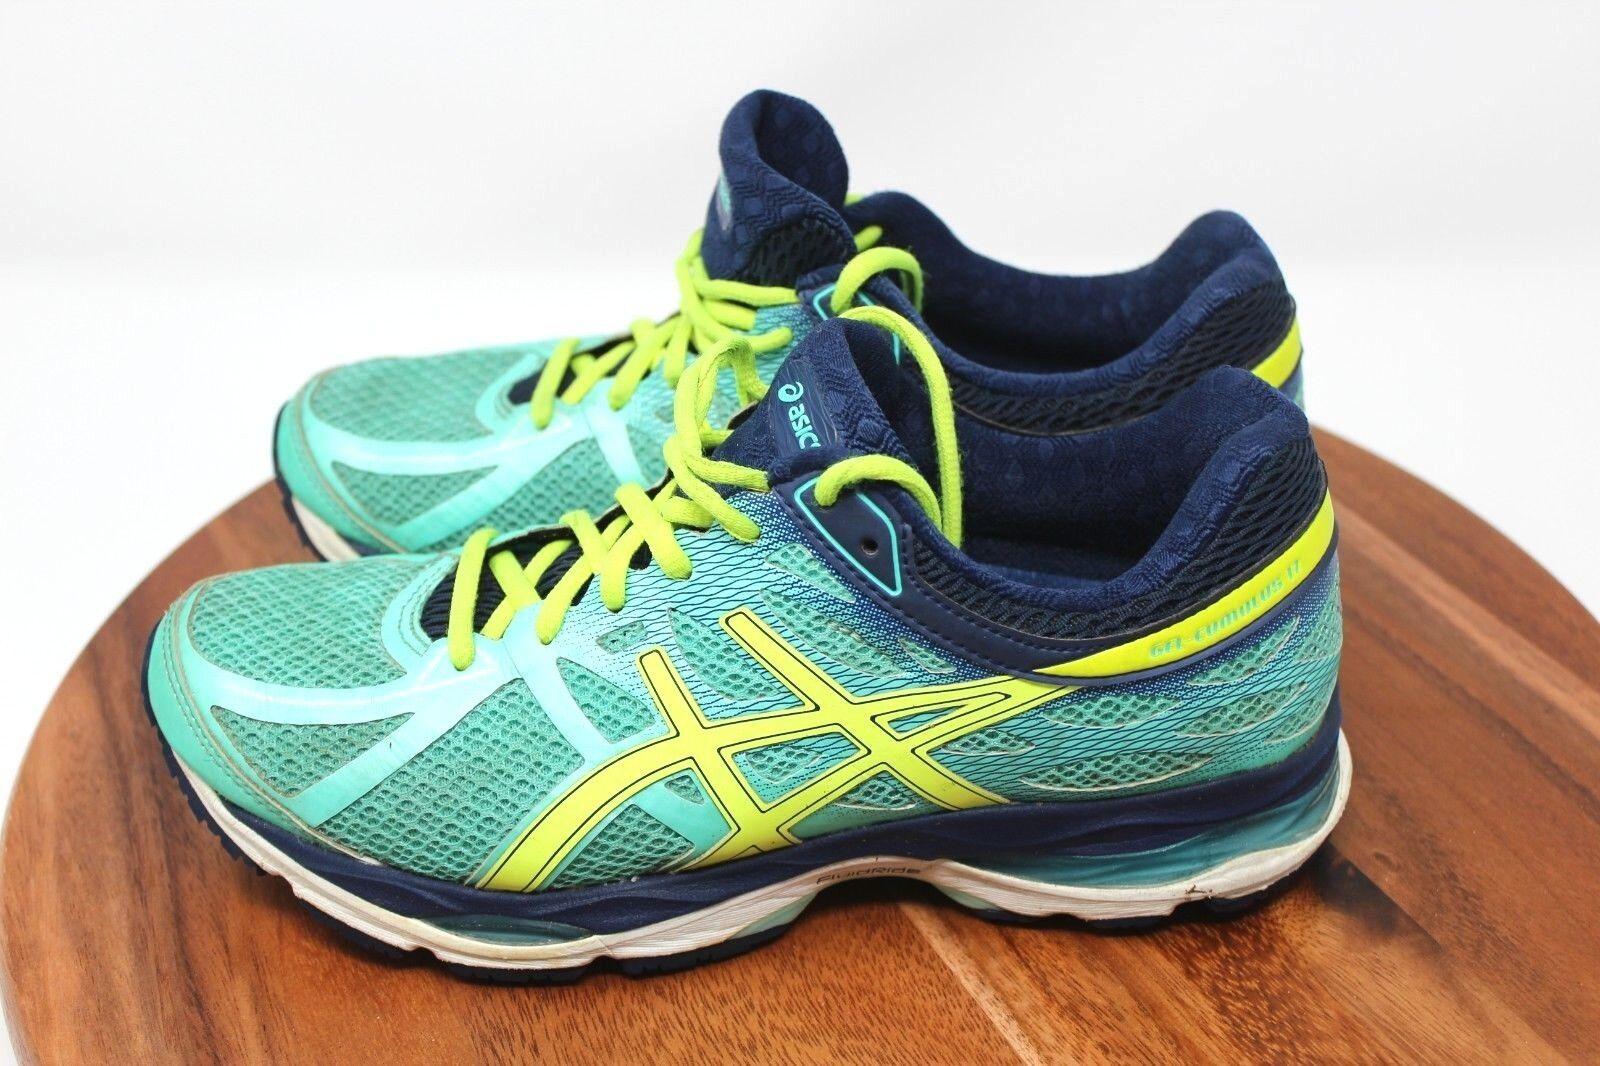 Asics Gel-Cumulus 17 Women's Running shoes Size 8 Teal T5D8N